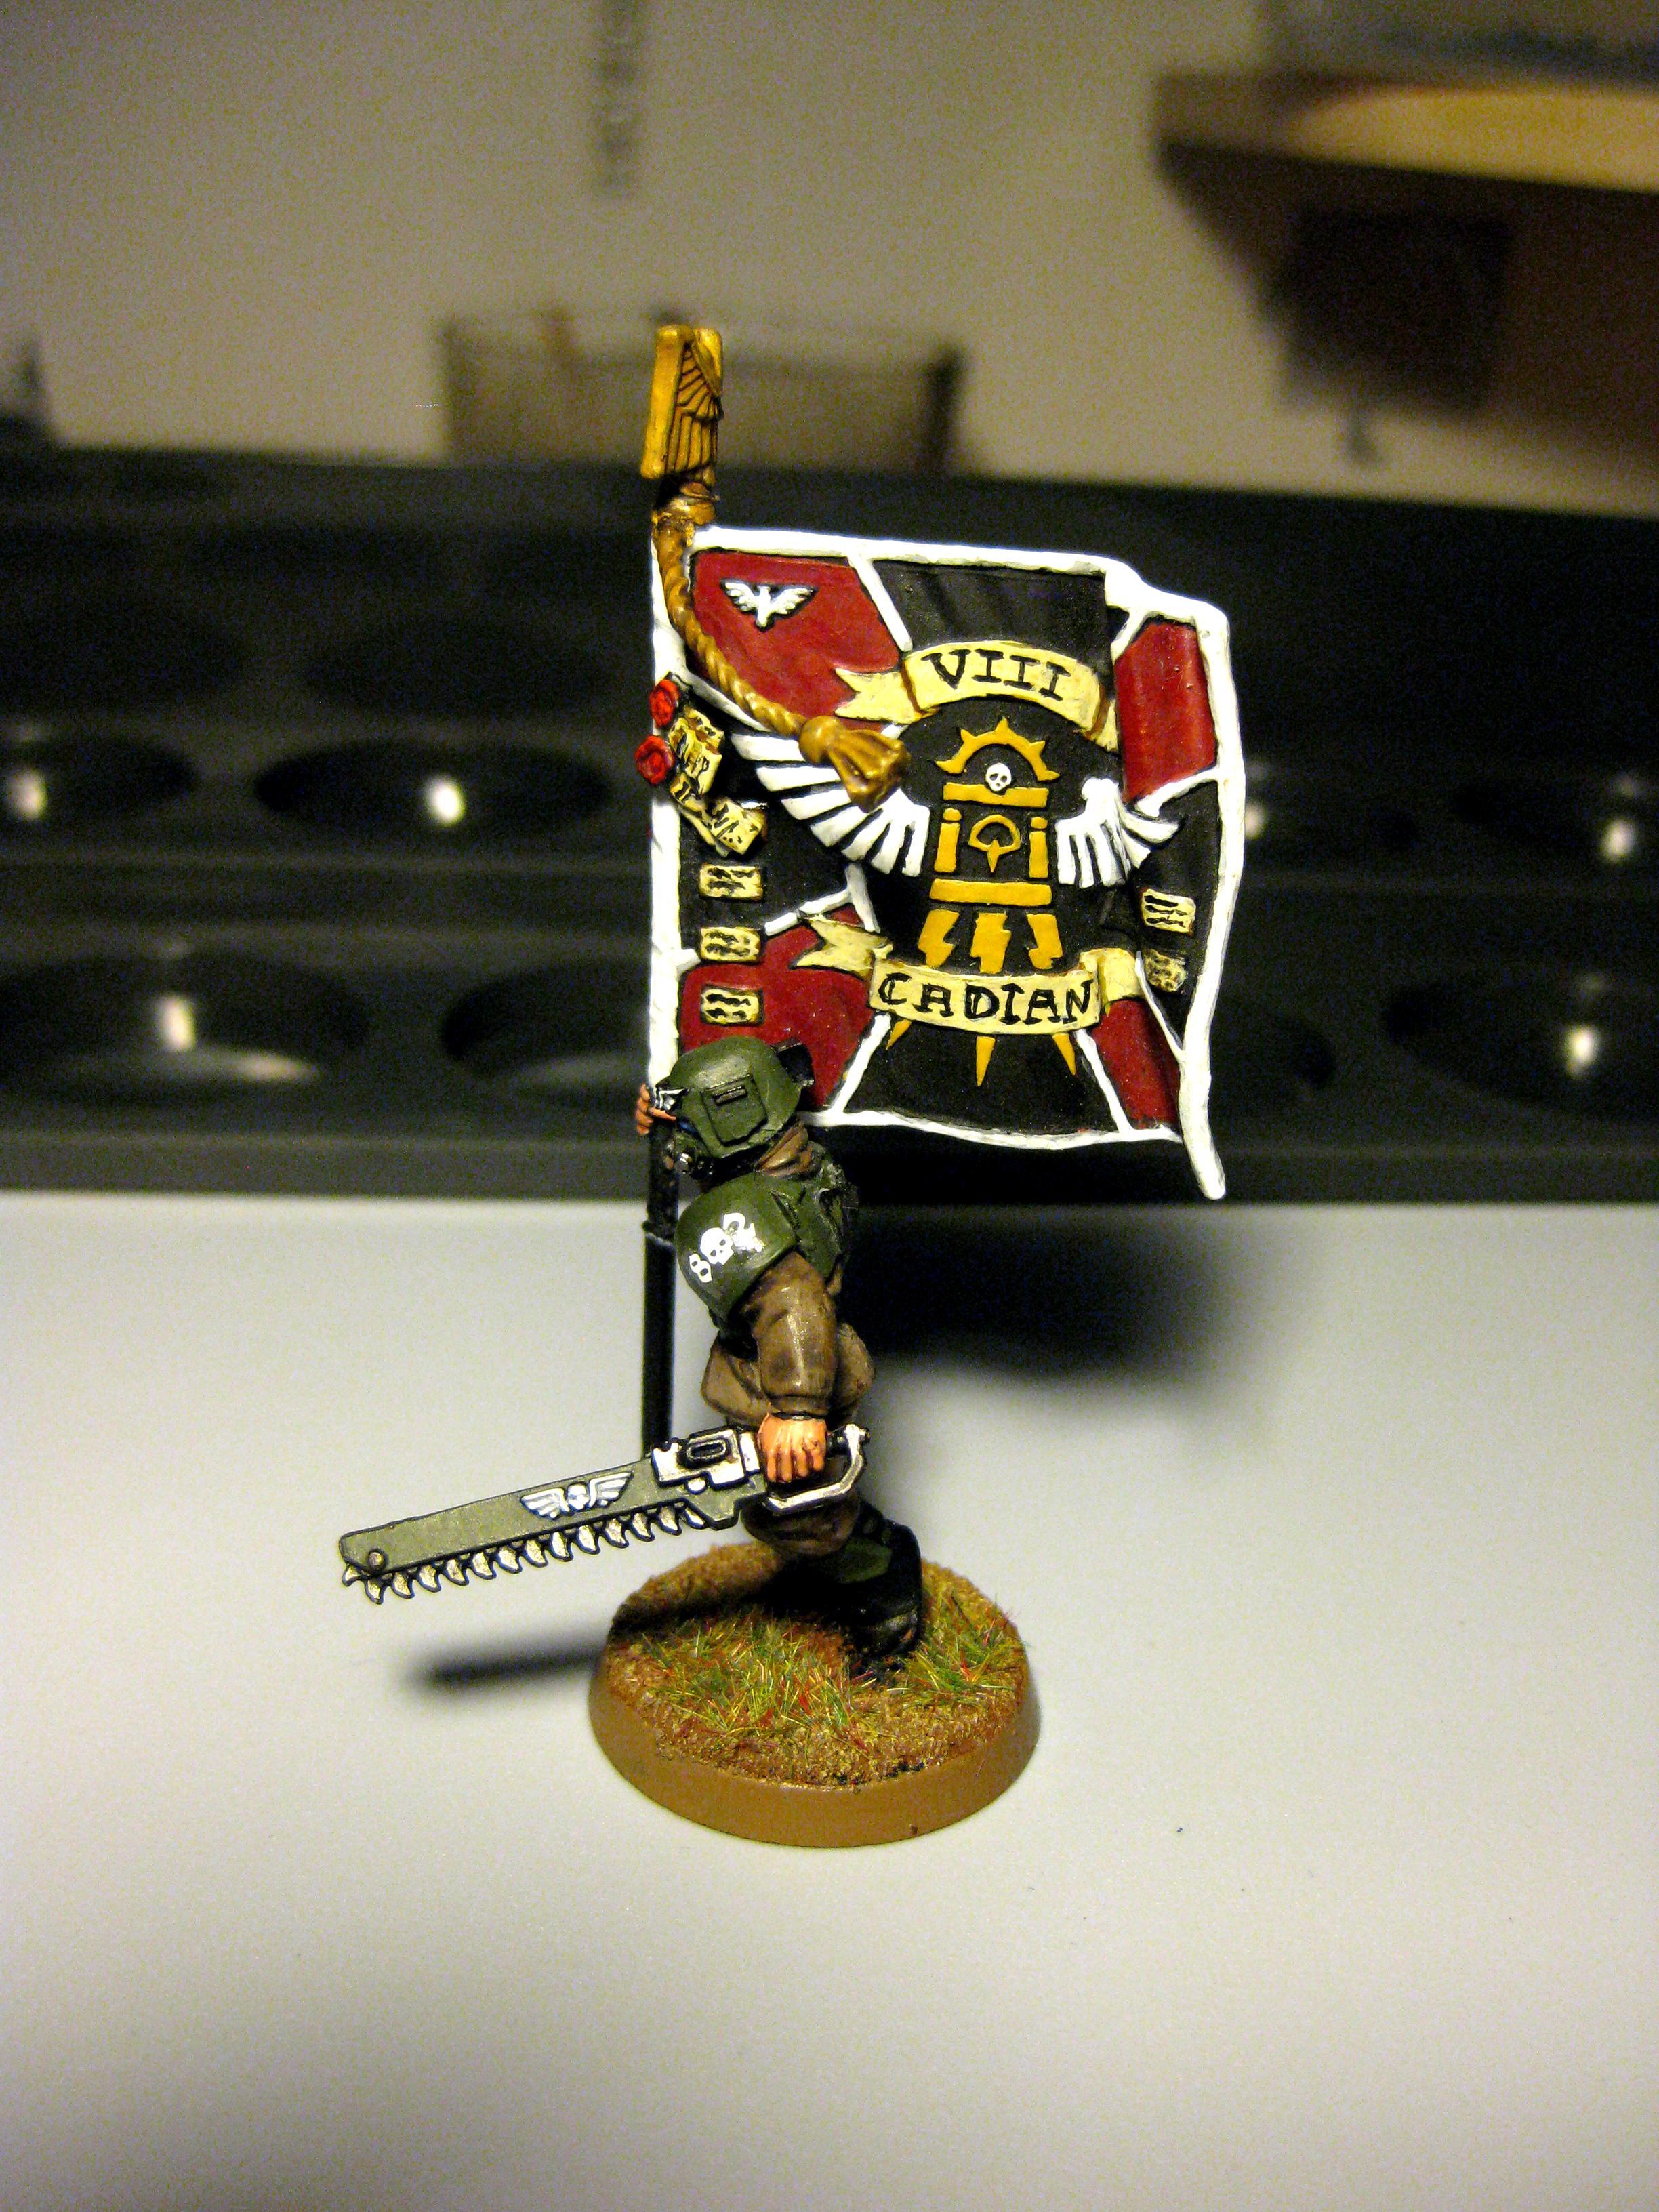 Bearer, Cadians, Imperial Guard, Infantry, Standard